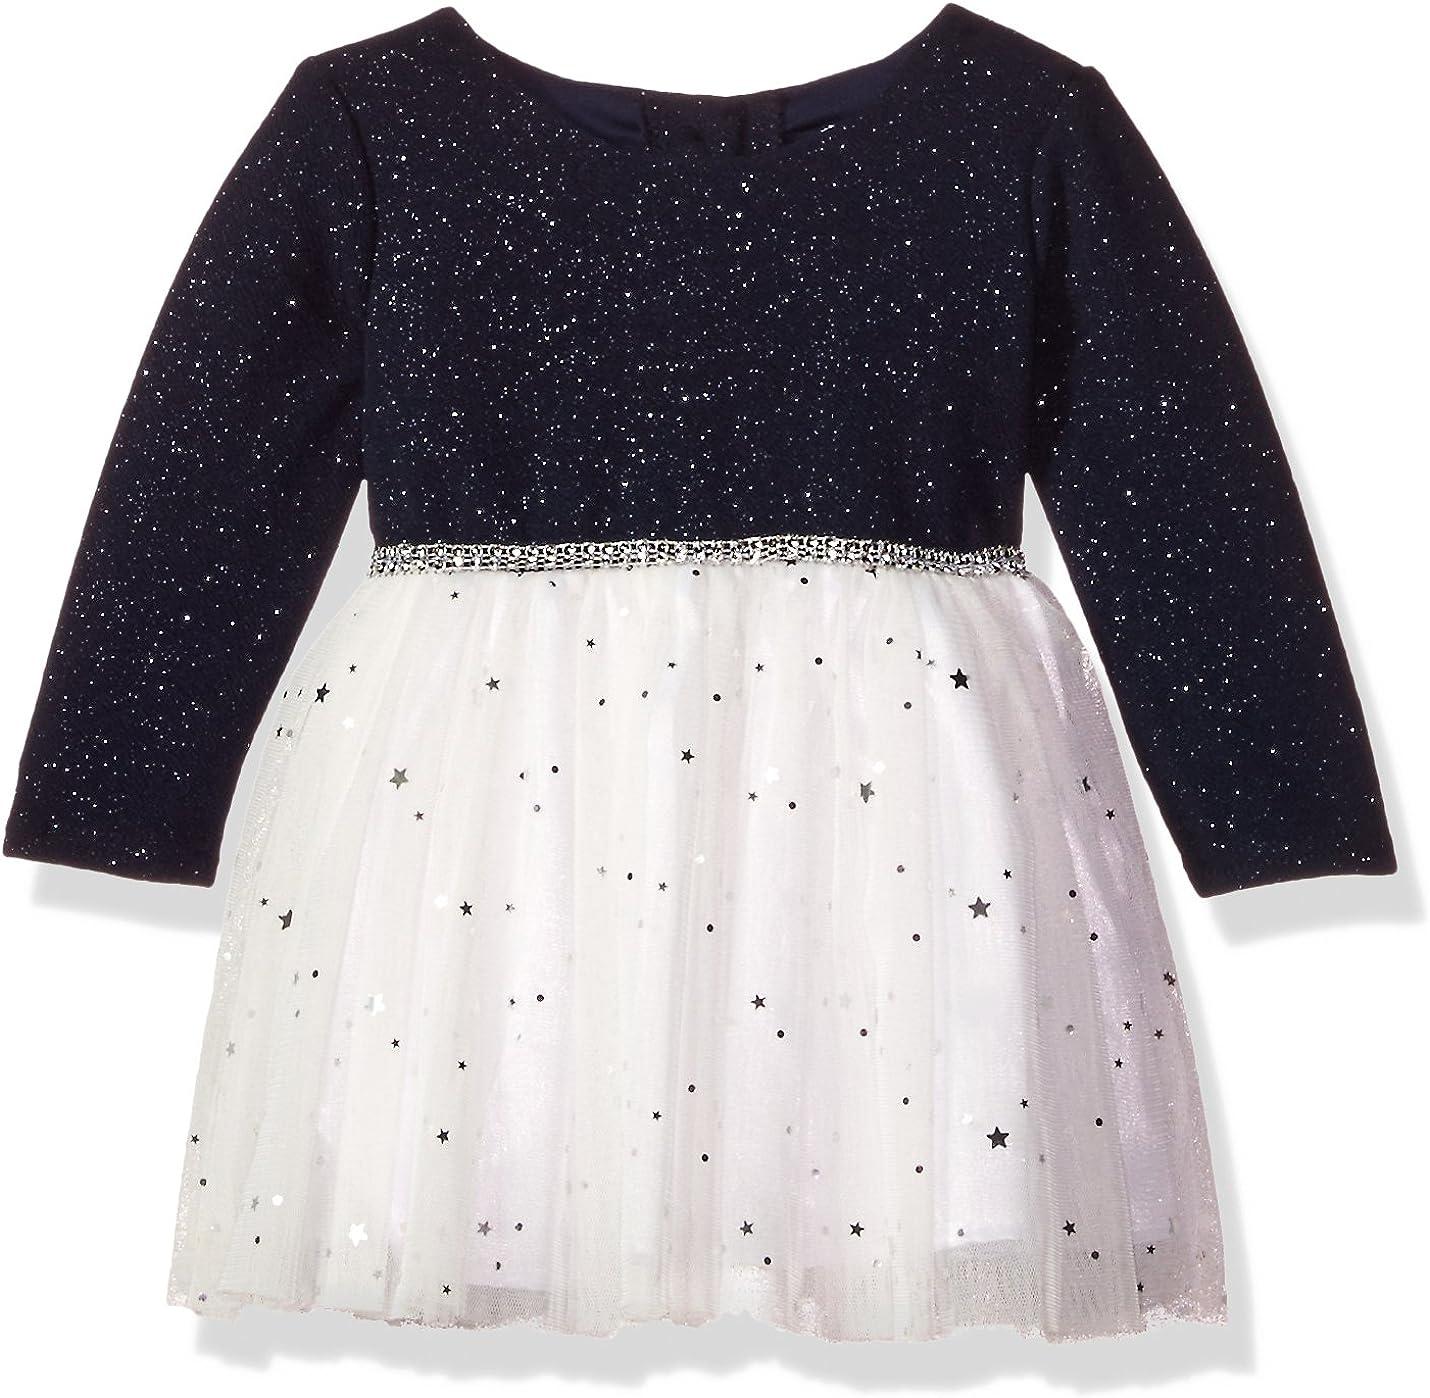 Youngland Baby Girls Sparkle Dot Mesh Skirt